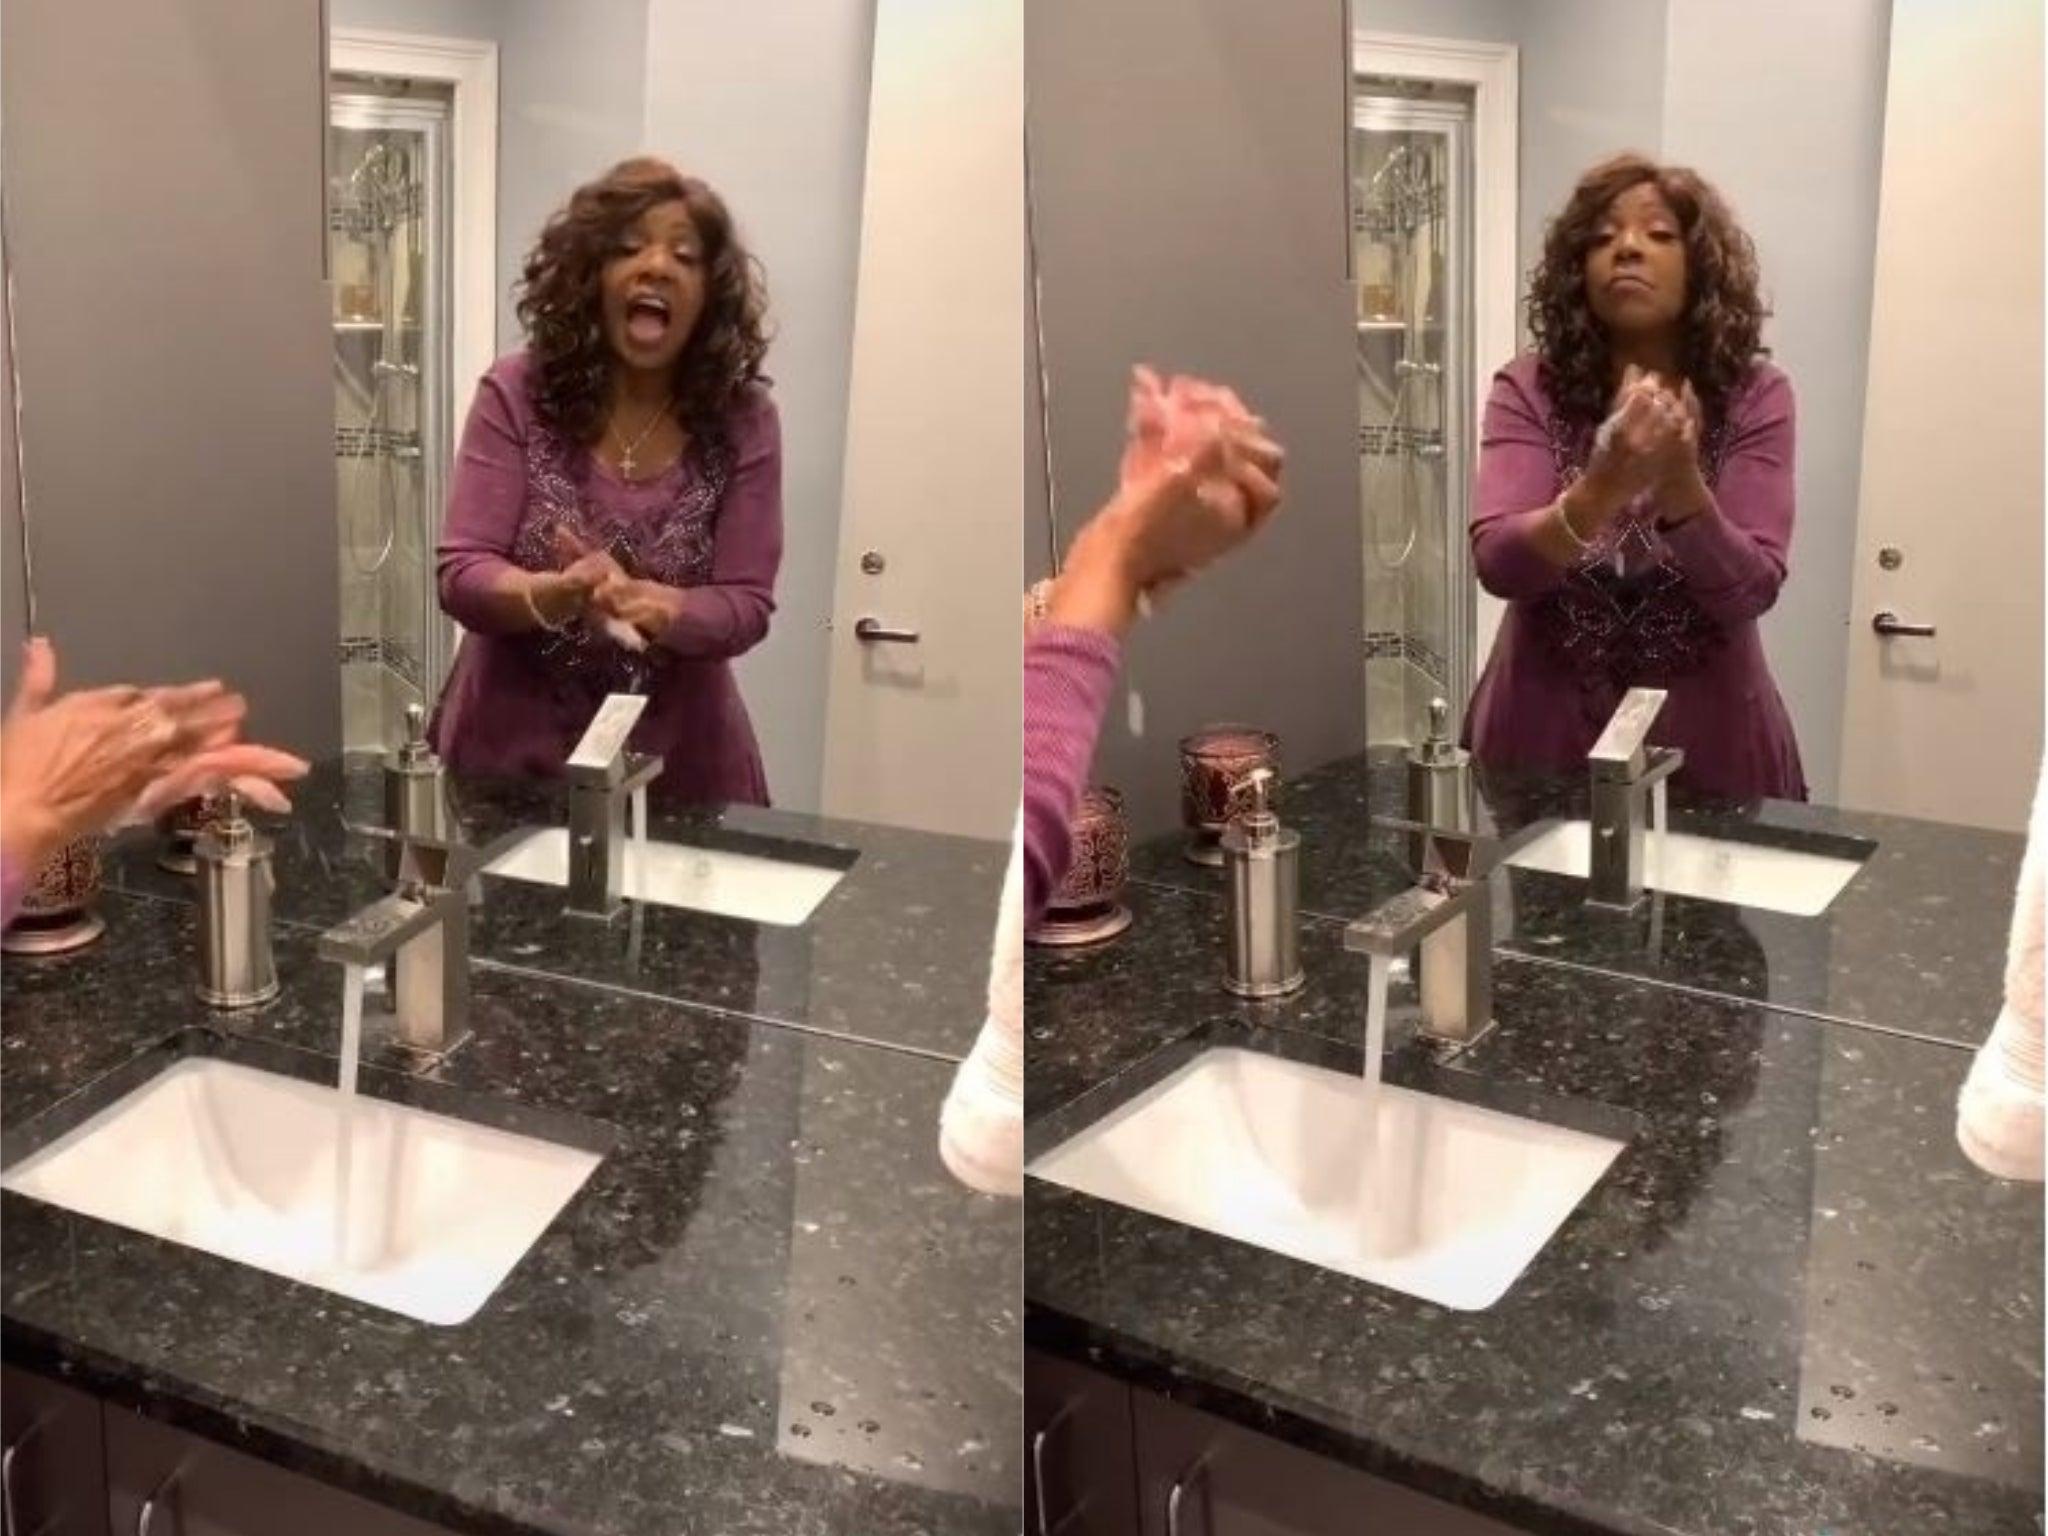 Coronavirus: Gloria Gaynor promotes hand-washing with viral 'I Will Survive' TikTok video